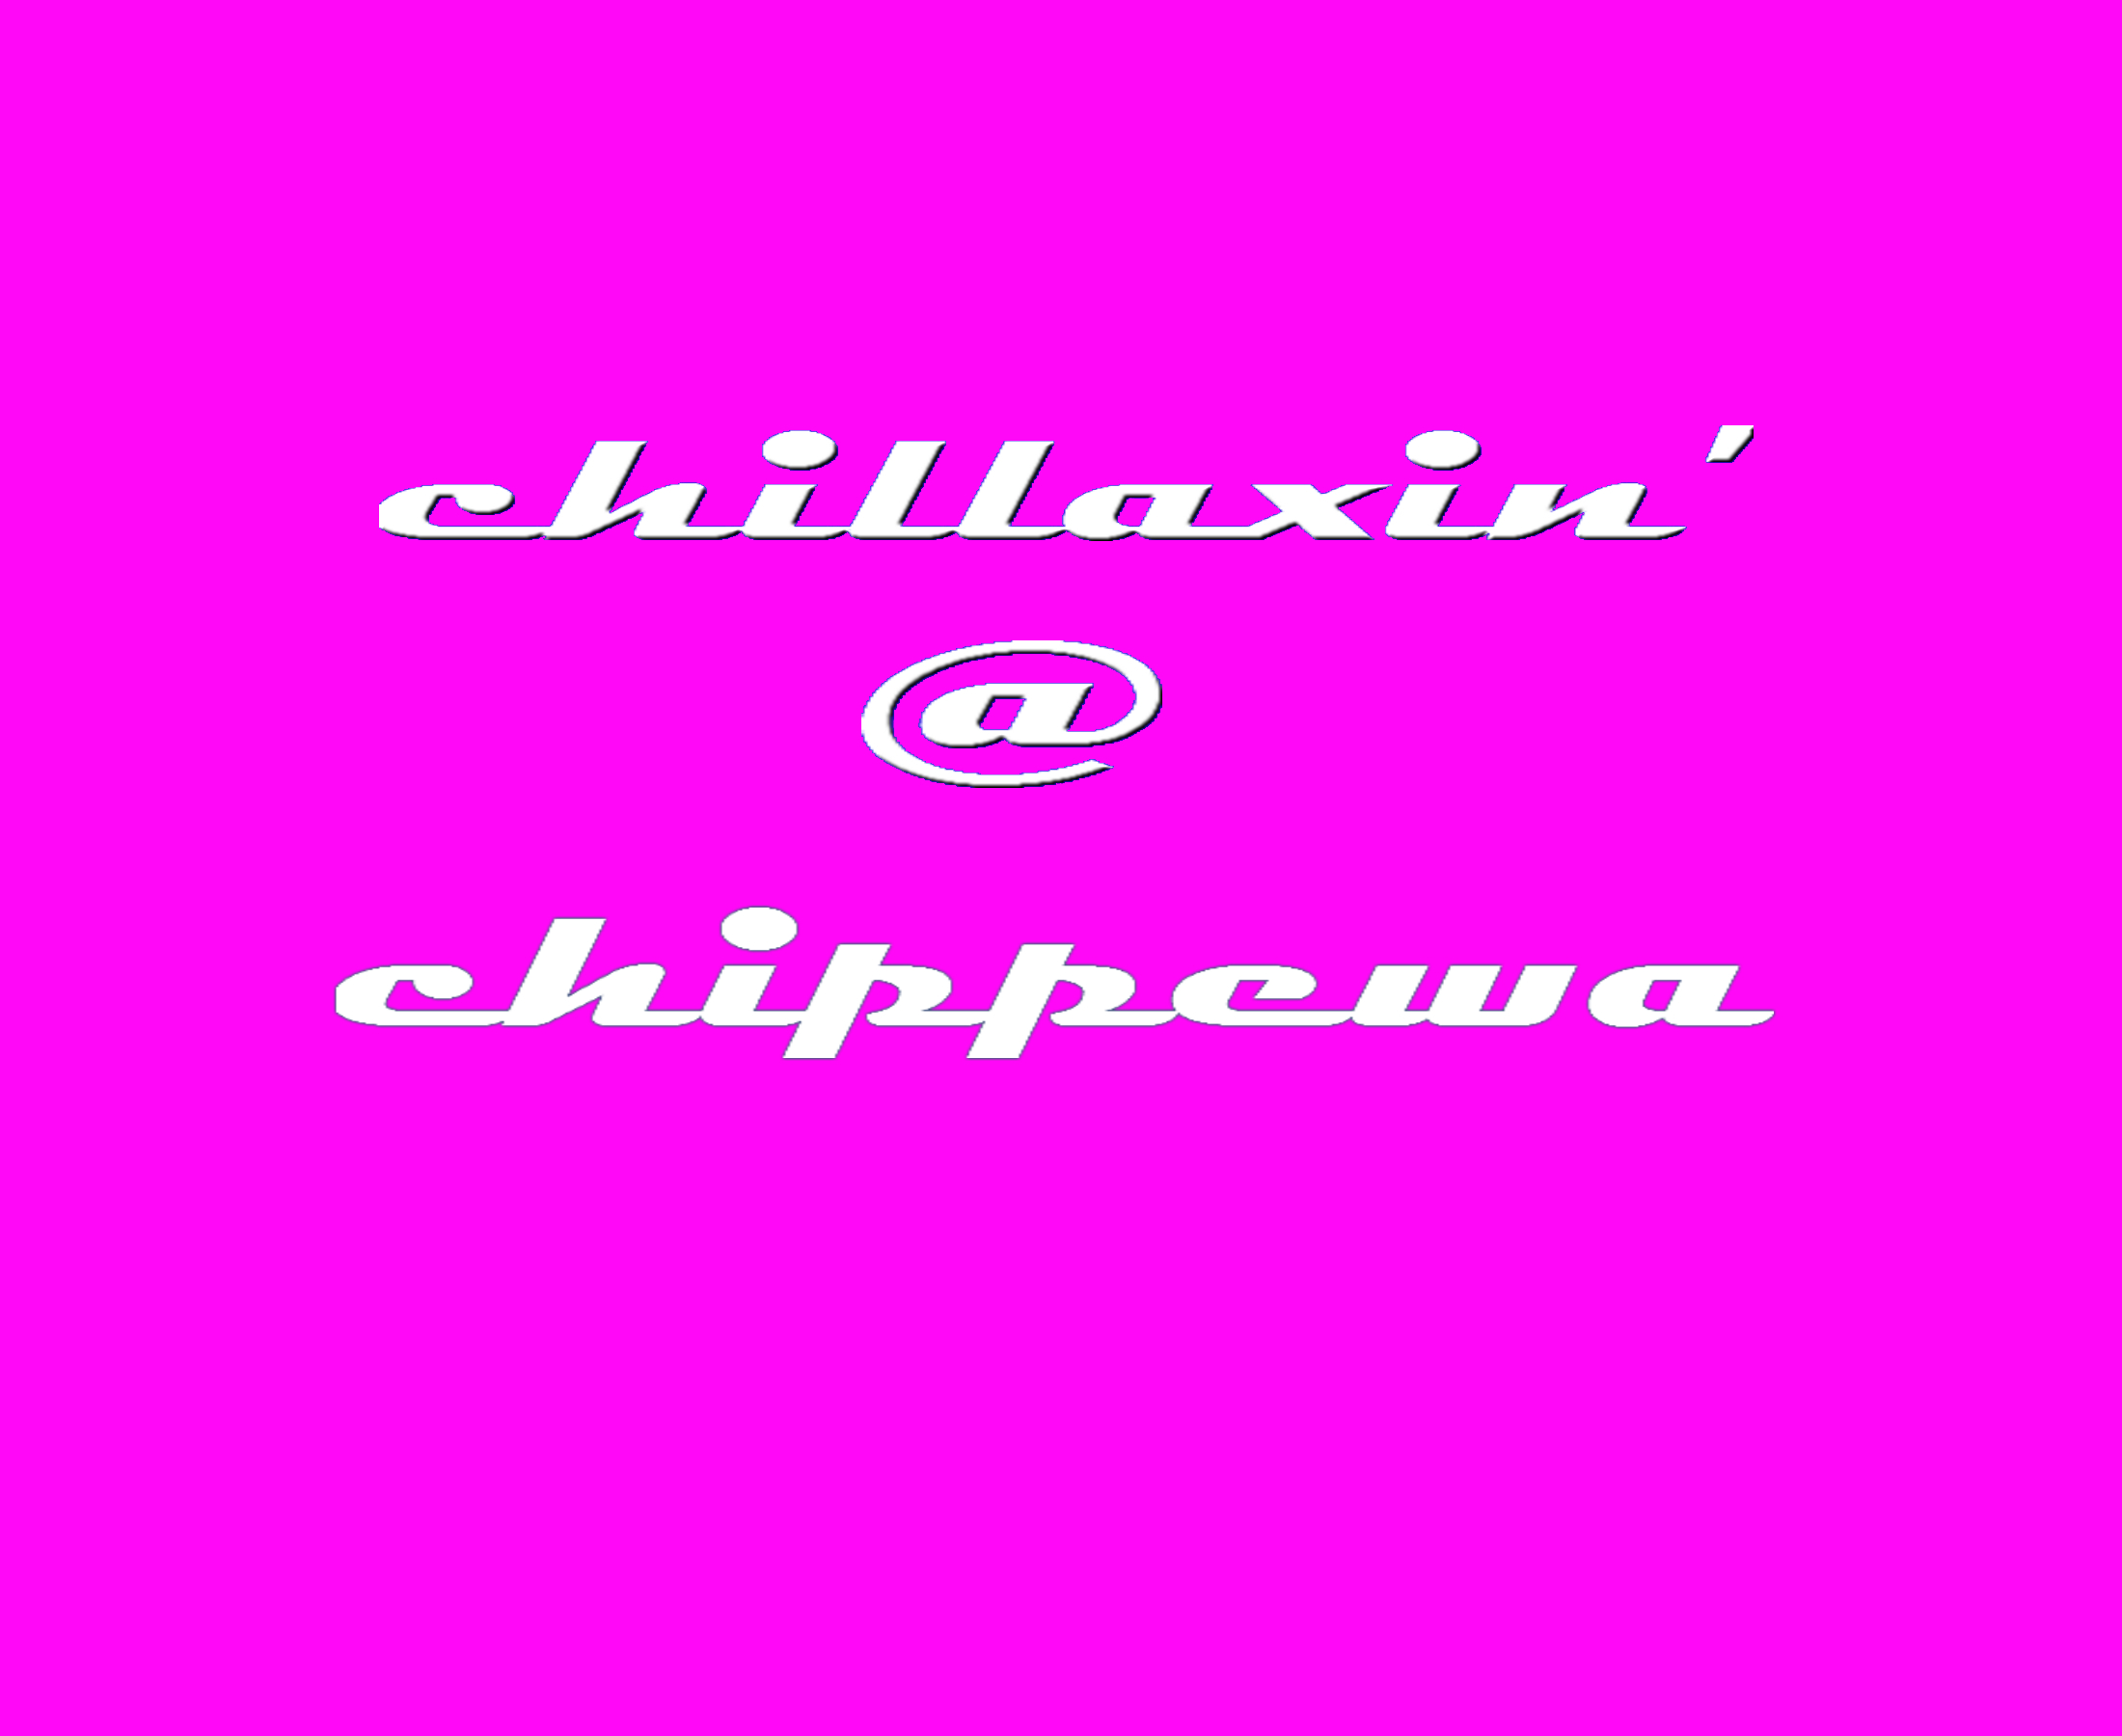 CHILLAXIN' AT CHIPPEWA